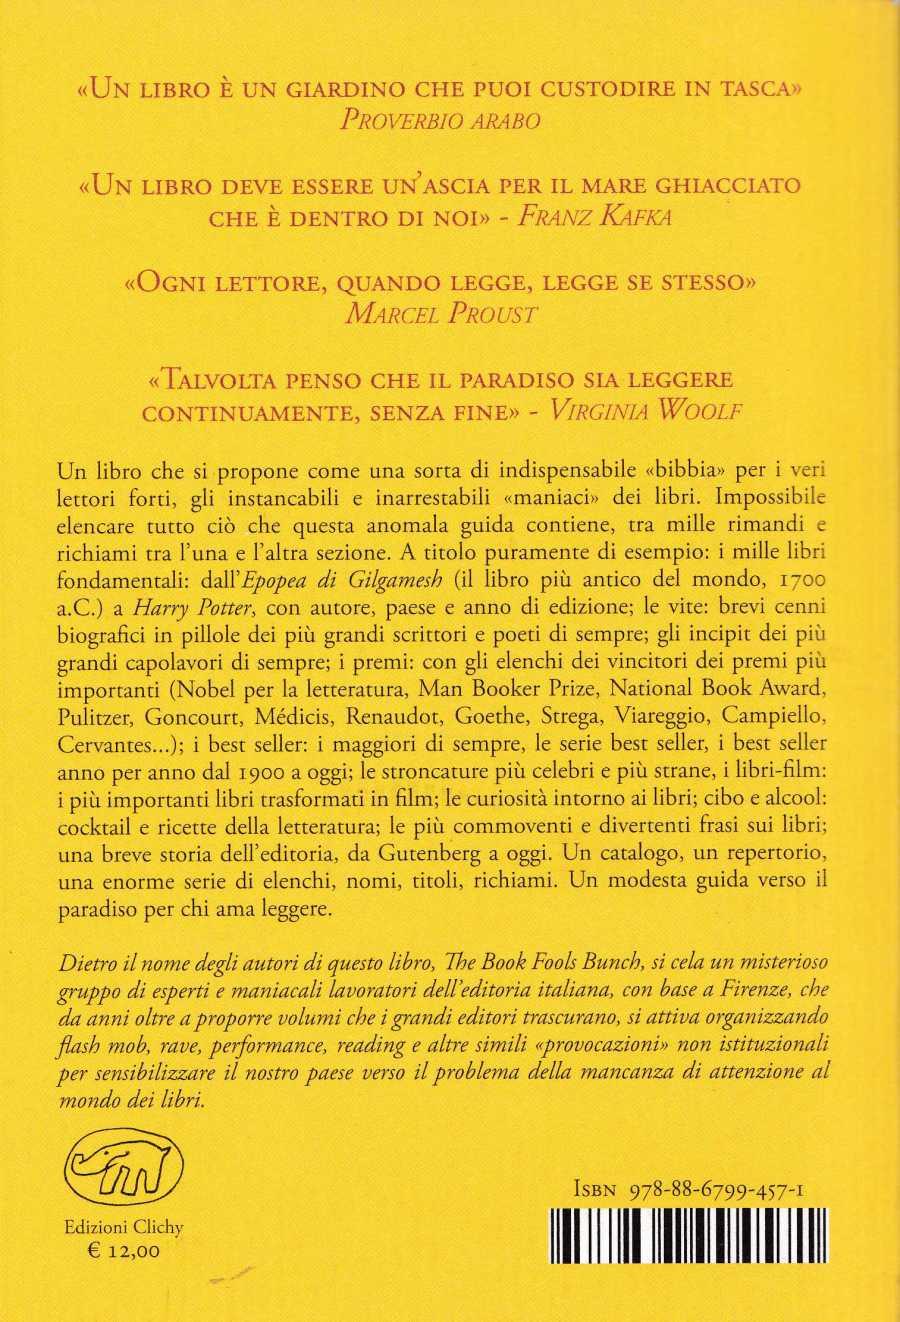 maniaci libri1788